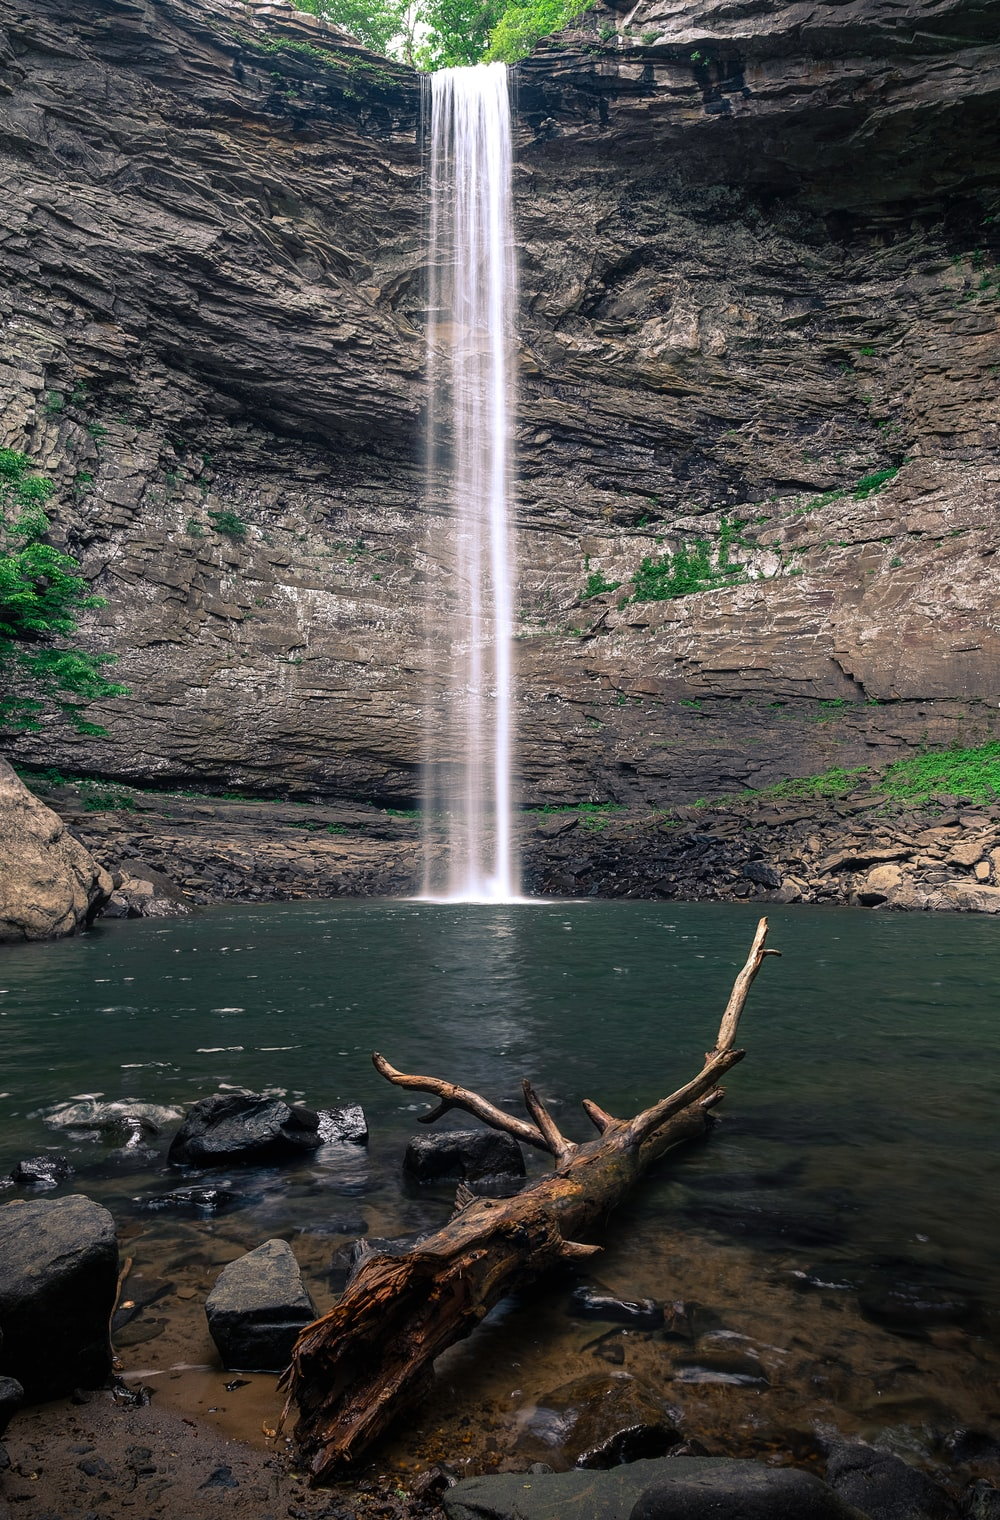 waterfalls on rocky mountain during daytime